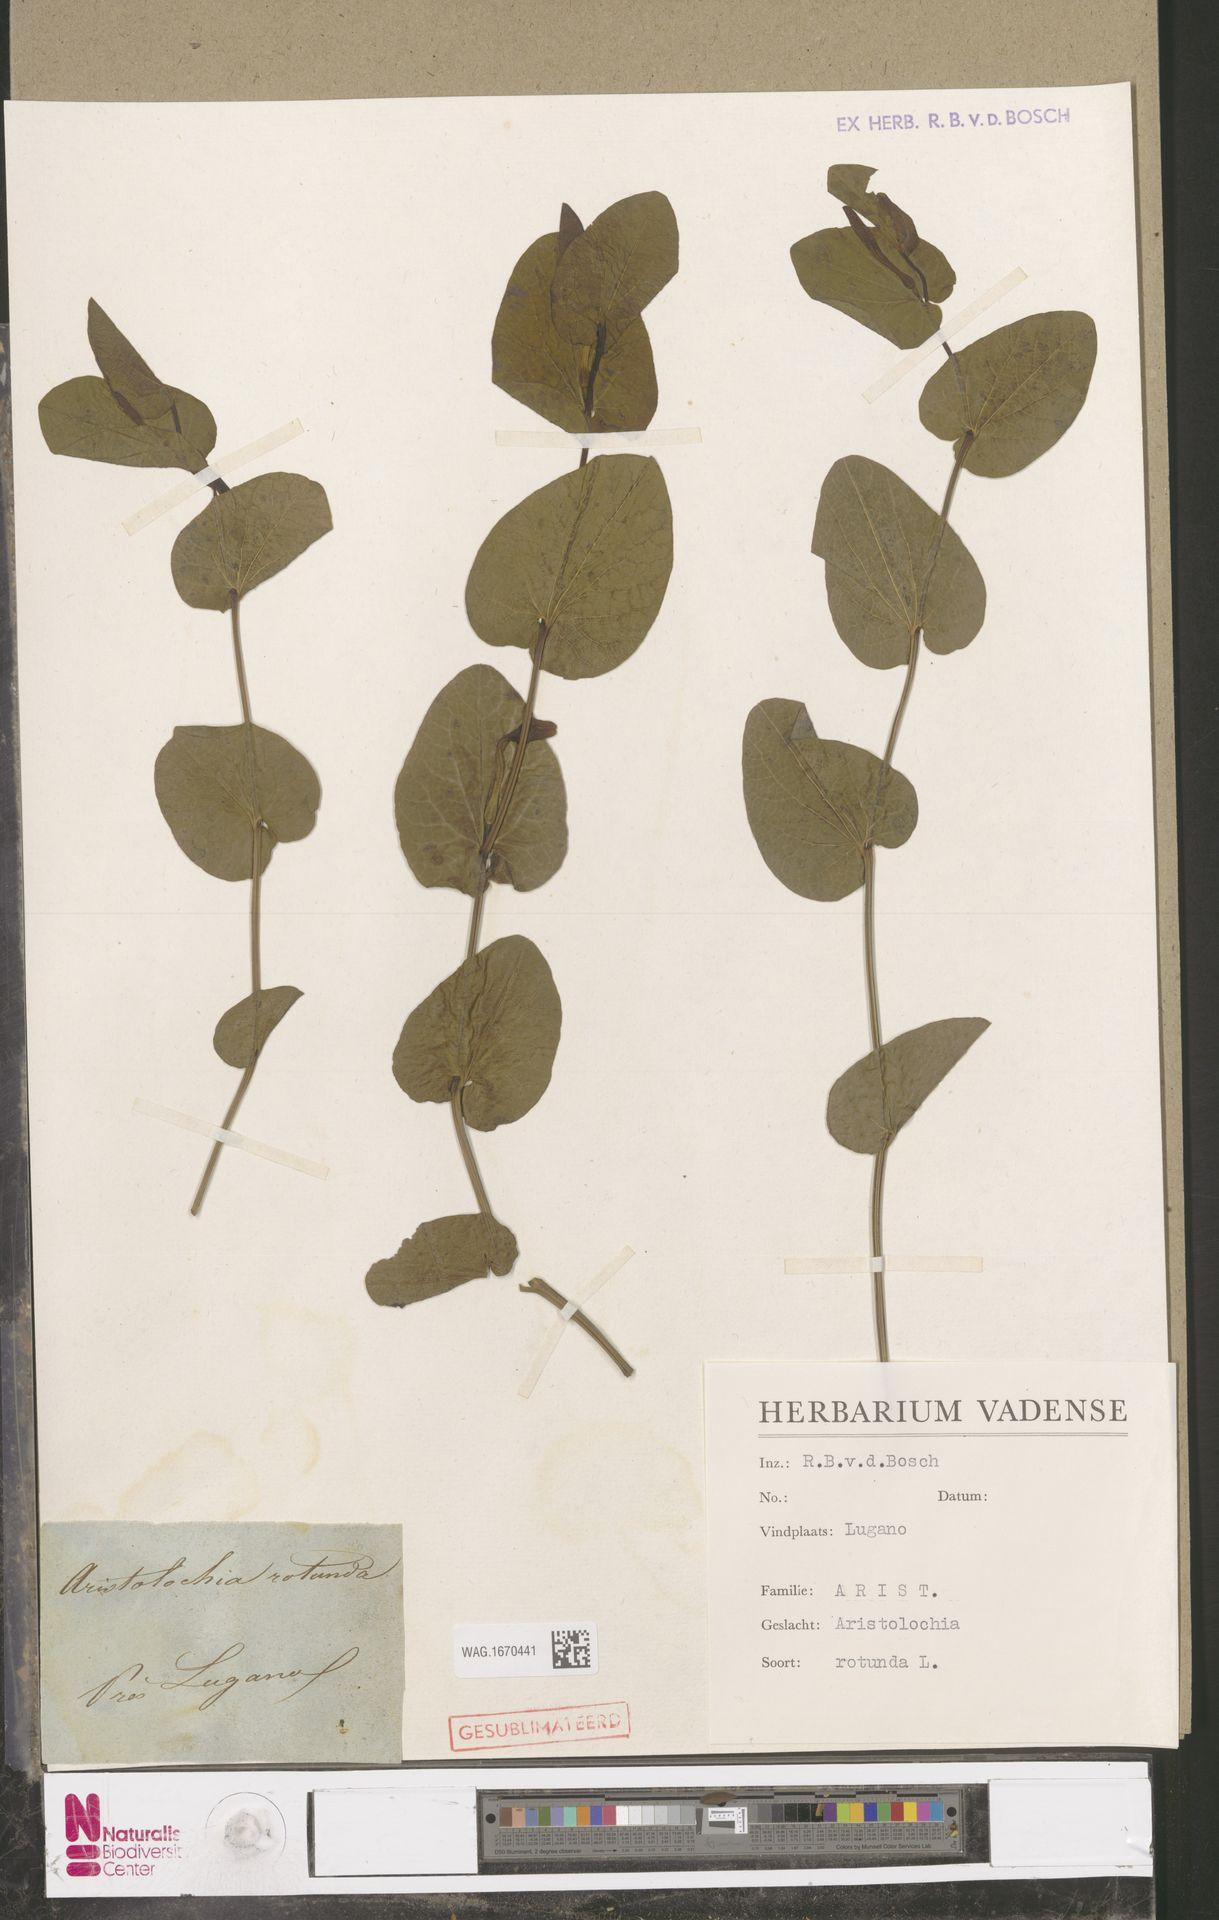 WAG.1670441   Aristolochia rotunda L.